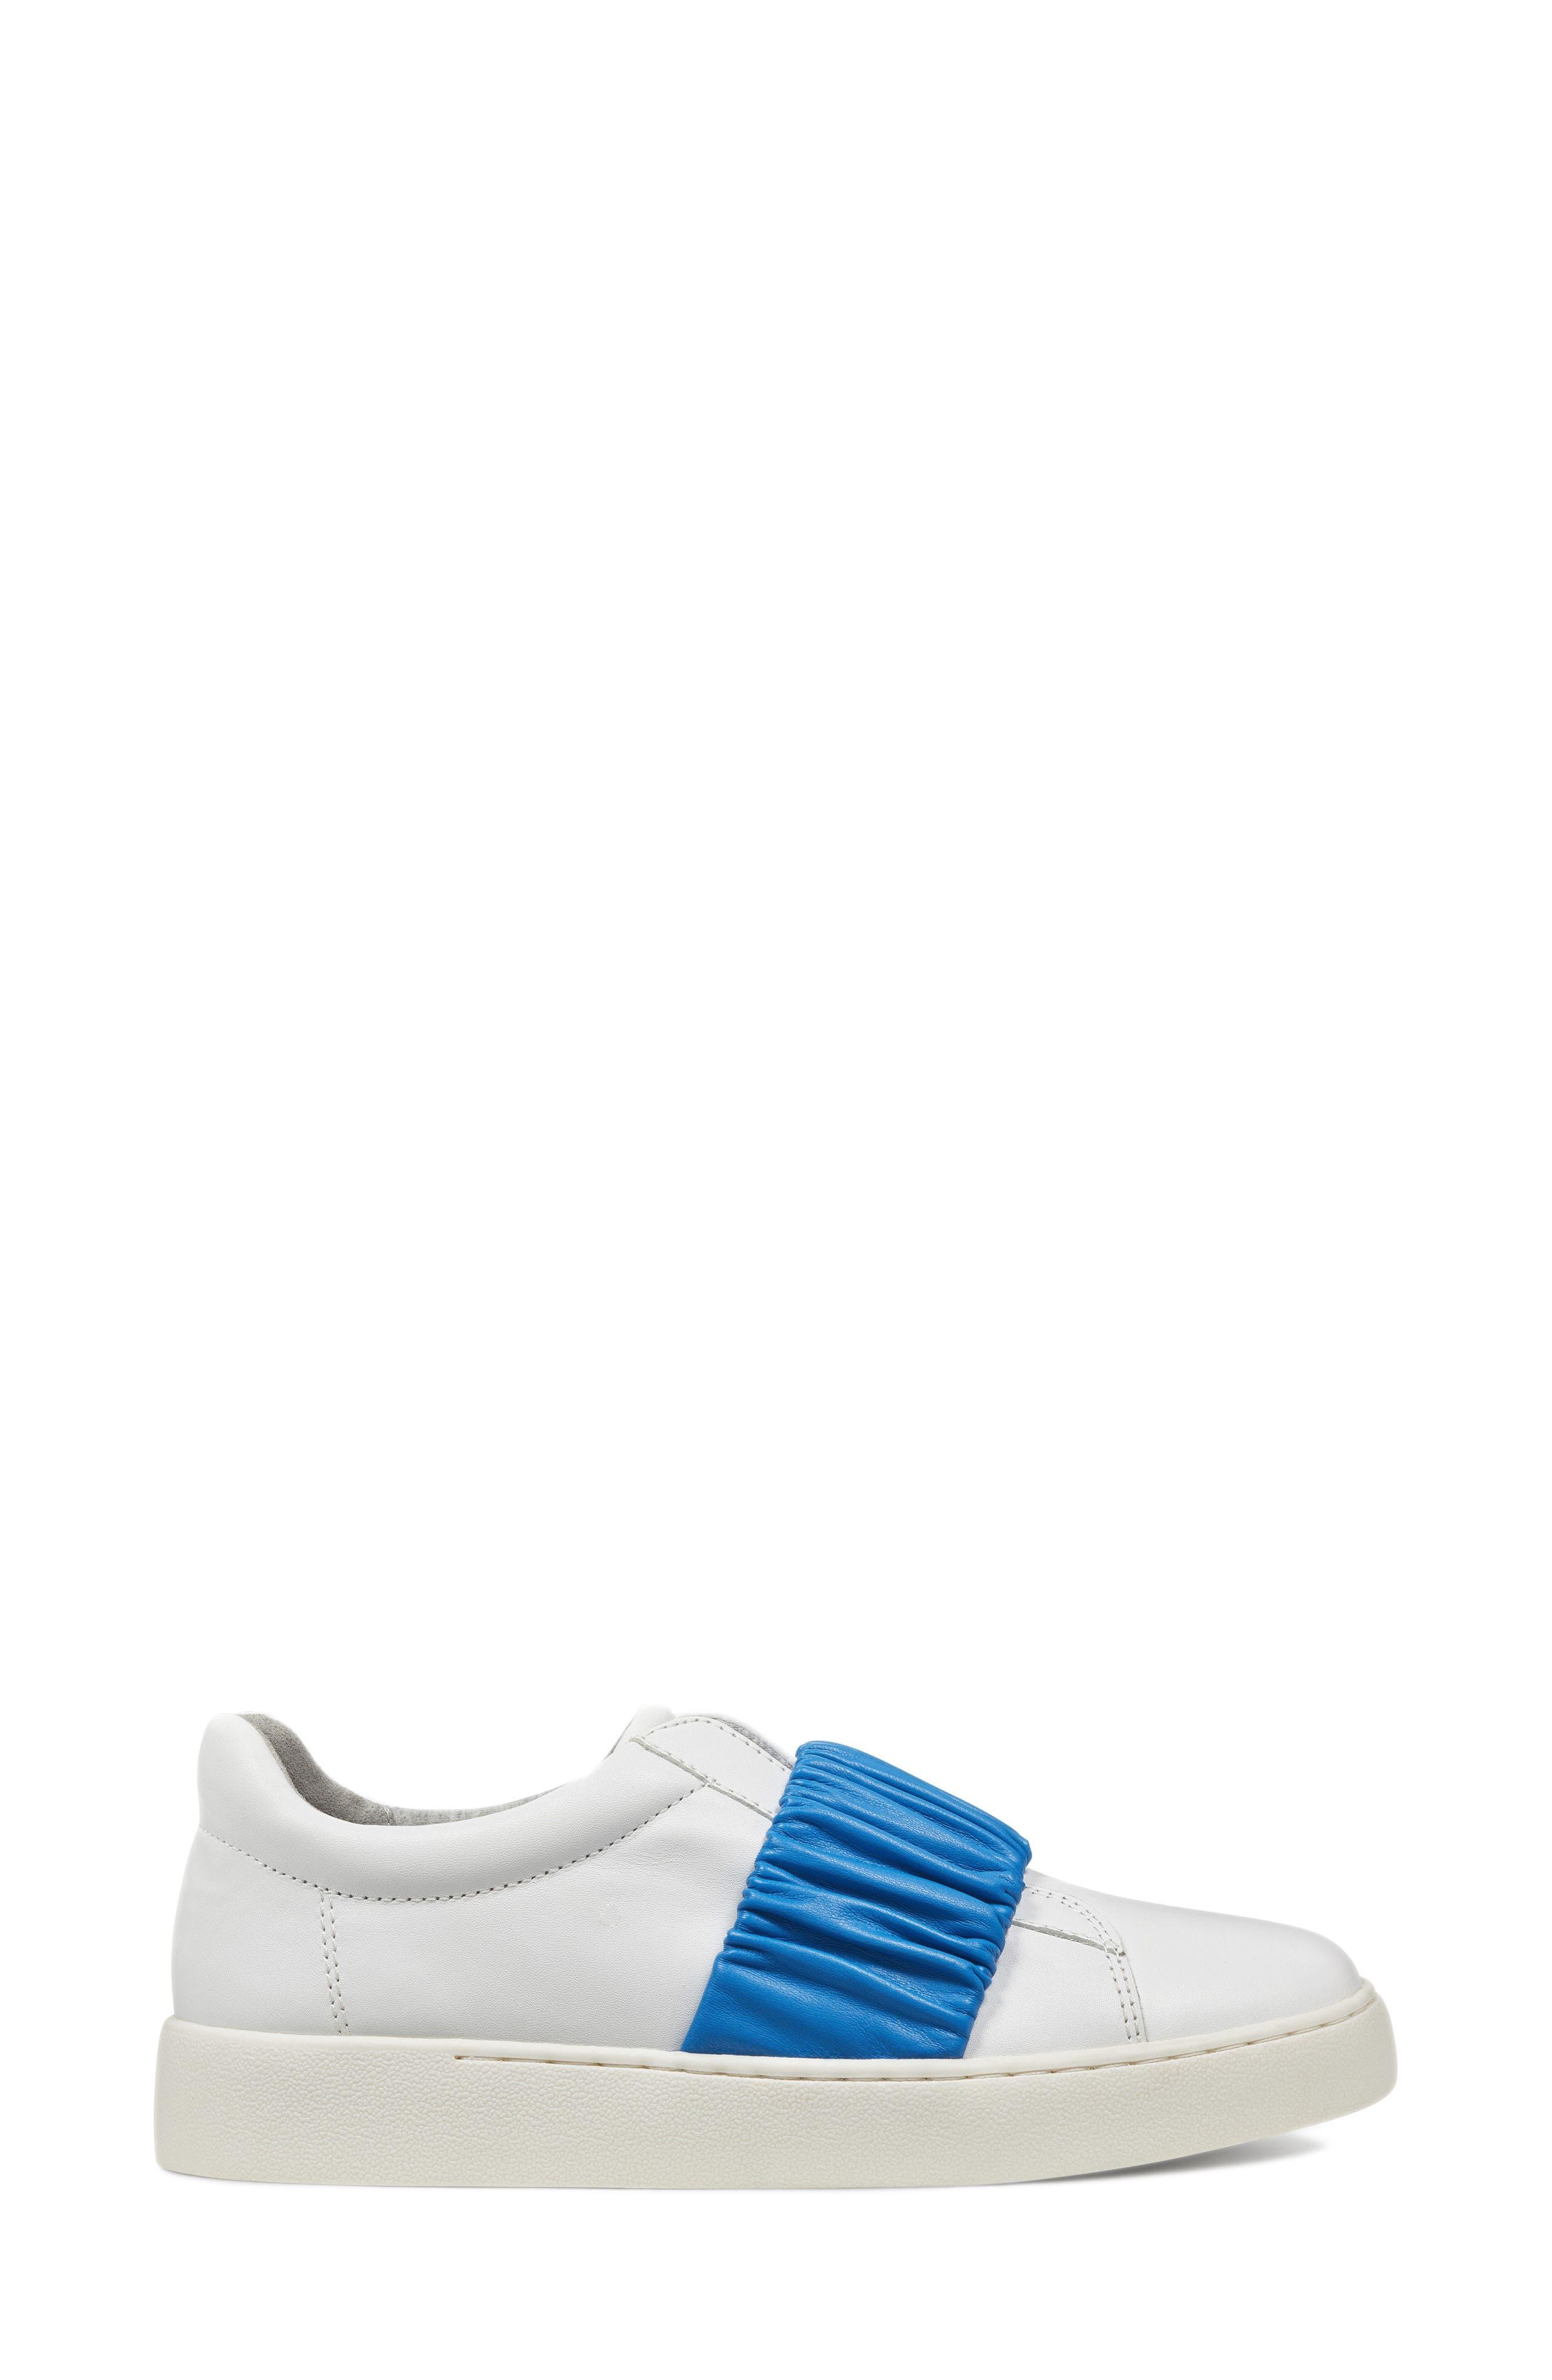 Pindiviah Slip-On Sneaker,                             Alternate thumbnail 3, color,                             100